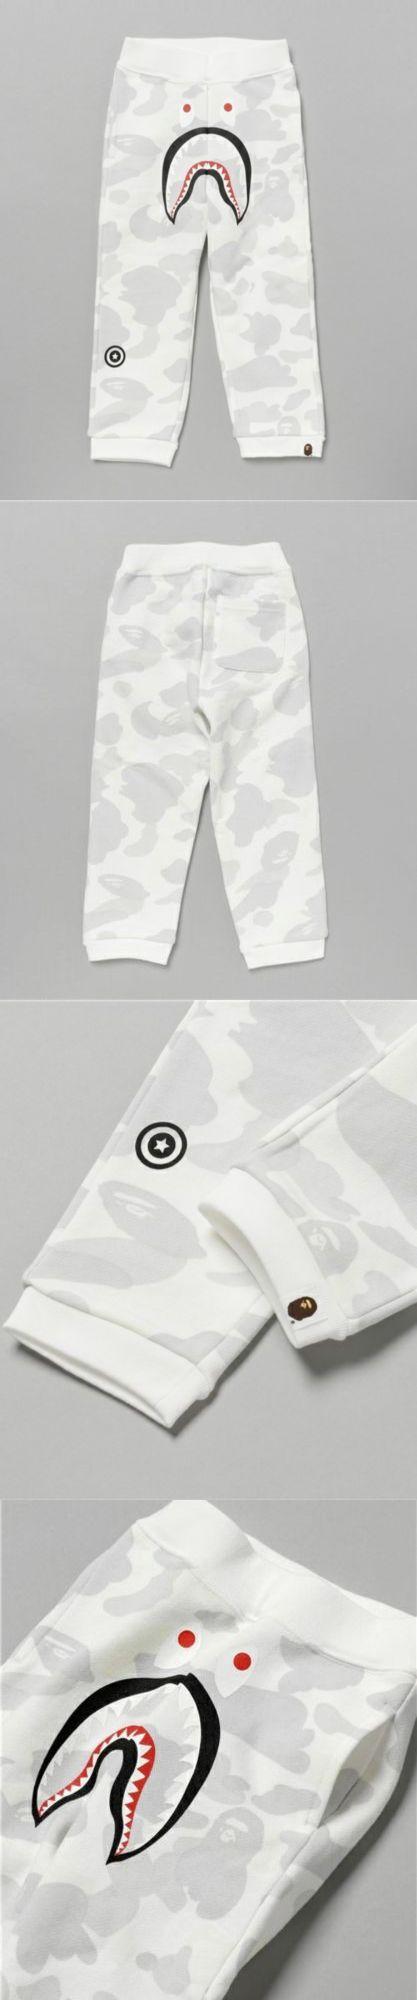 Pants 175654: A Bathing Ape City Camo Shark Sweat Pants Bape Kids Camouflage Pants From Japan -> BUY IT NOW ONLY: $178 on eBay!